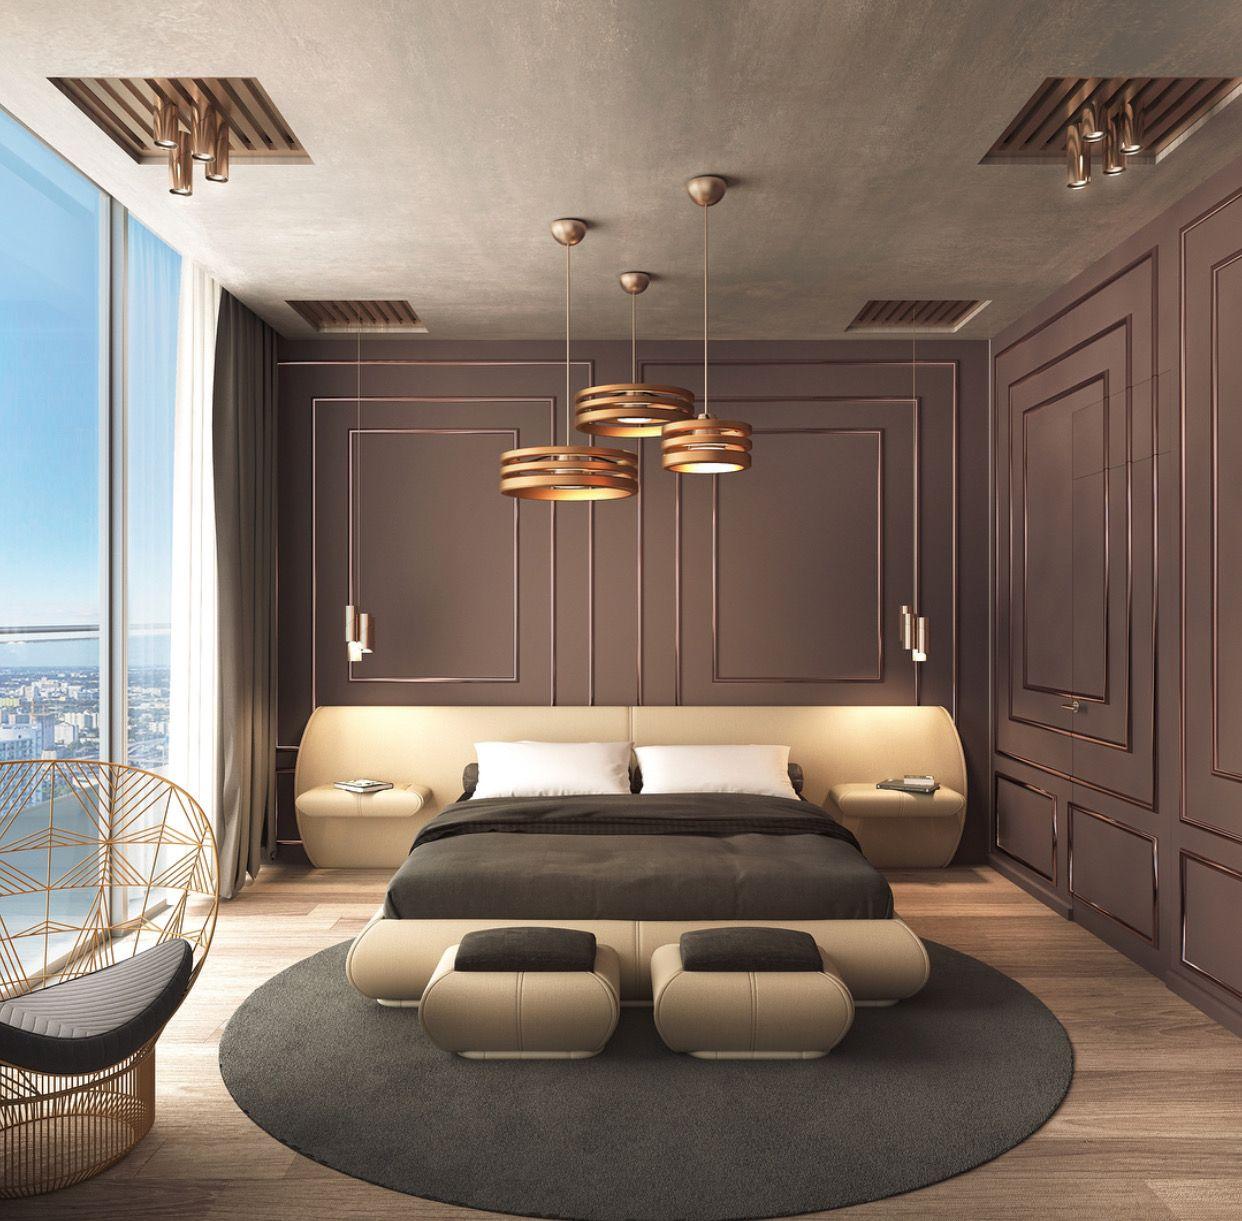 Pin By Boris Vasovski On Ideas For Interior Design